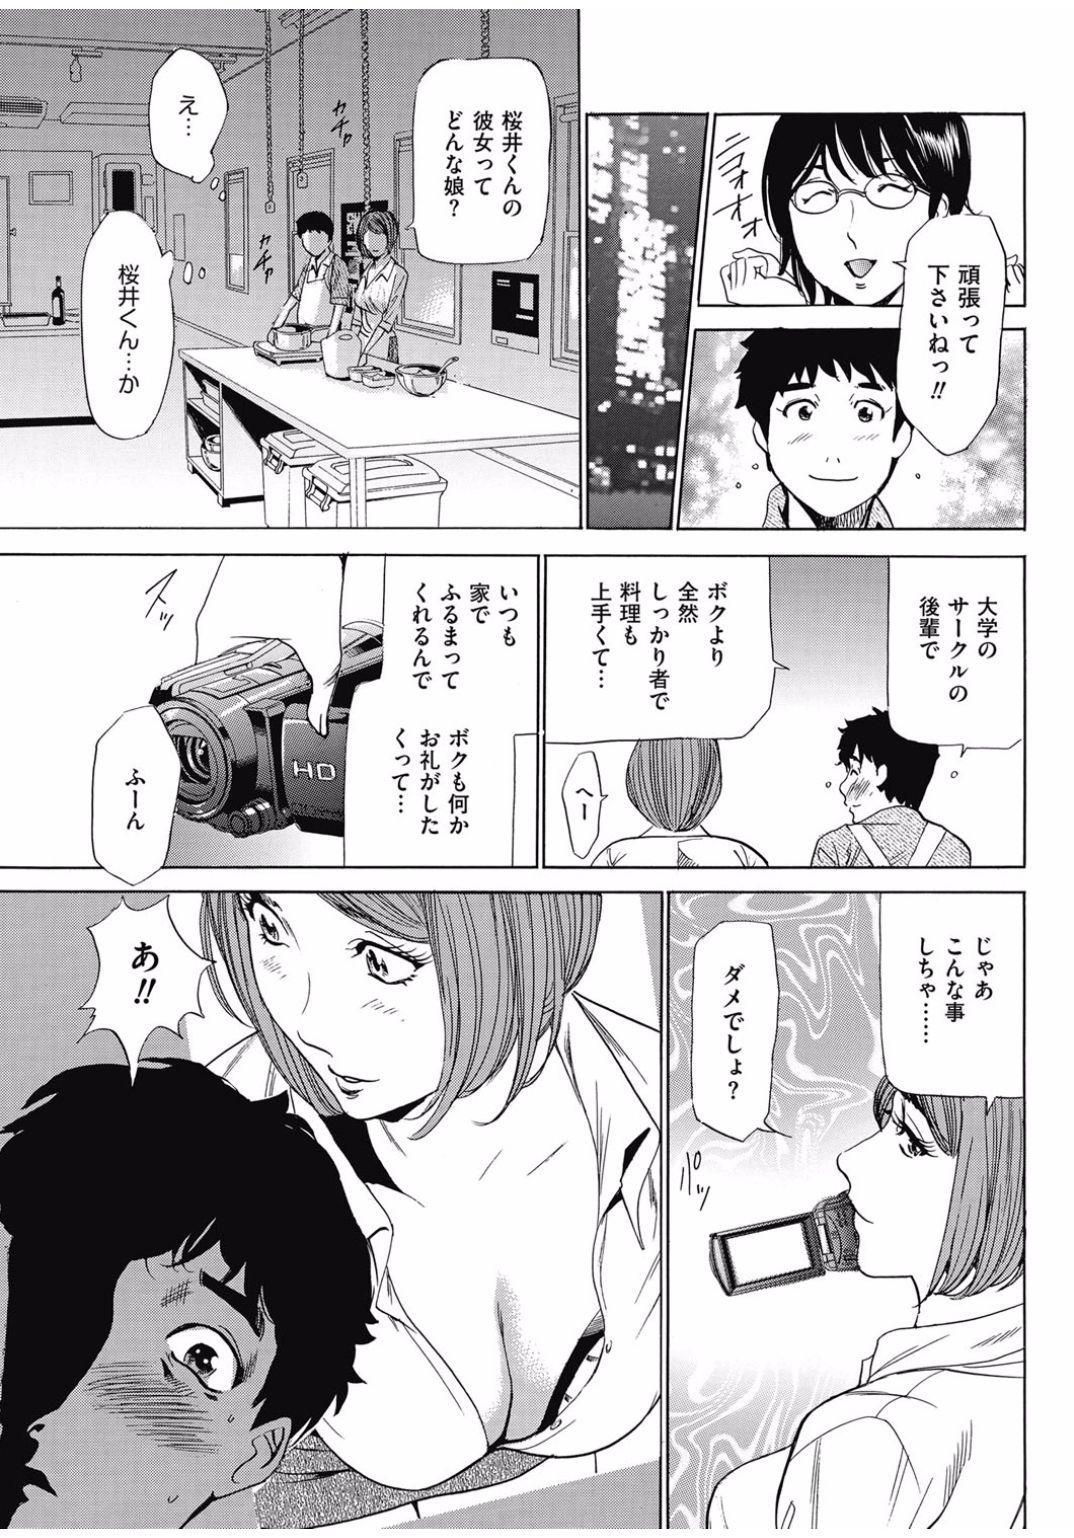 Wa Usuki Ipa a 1-10 79